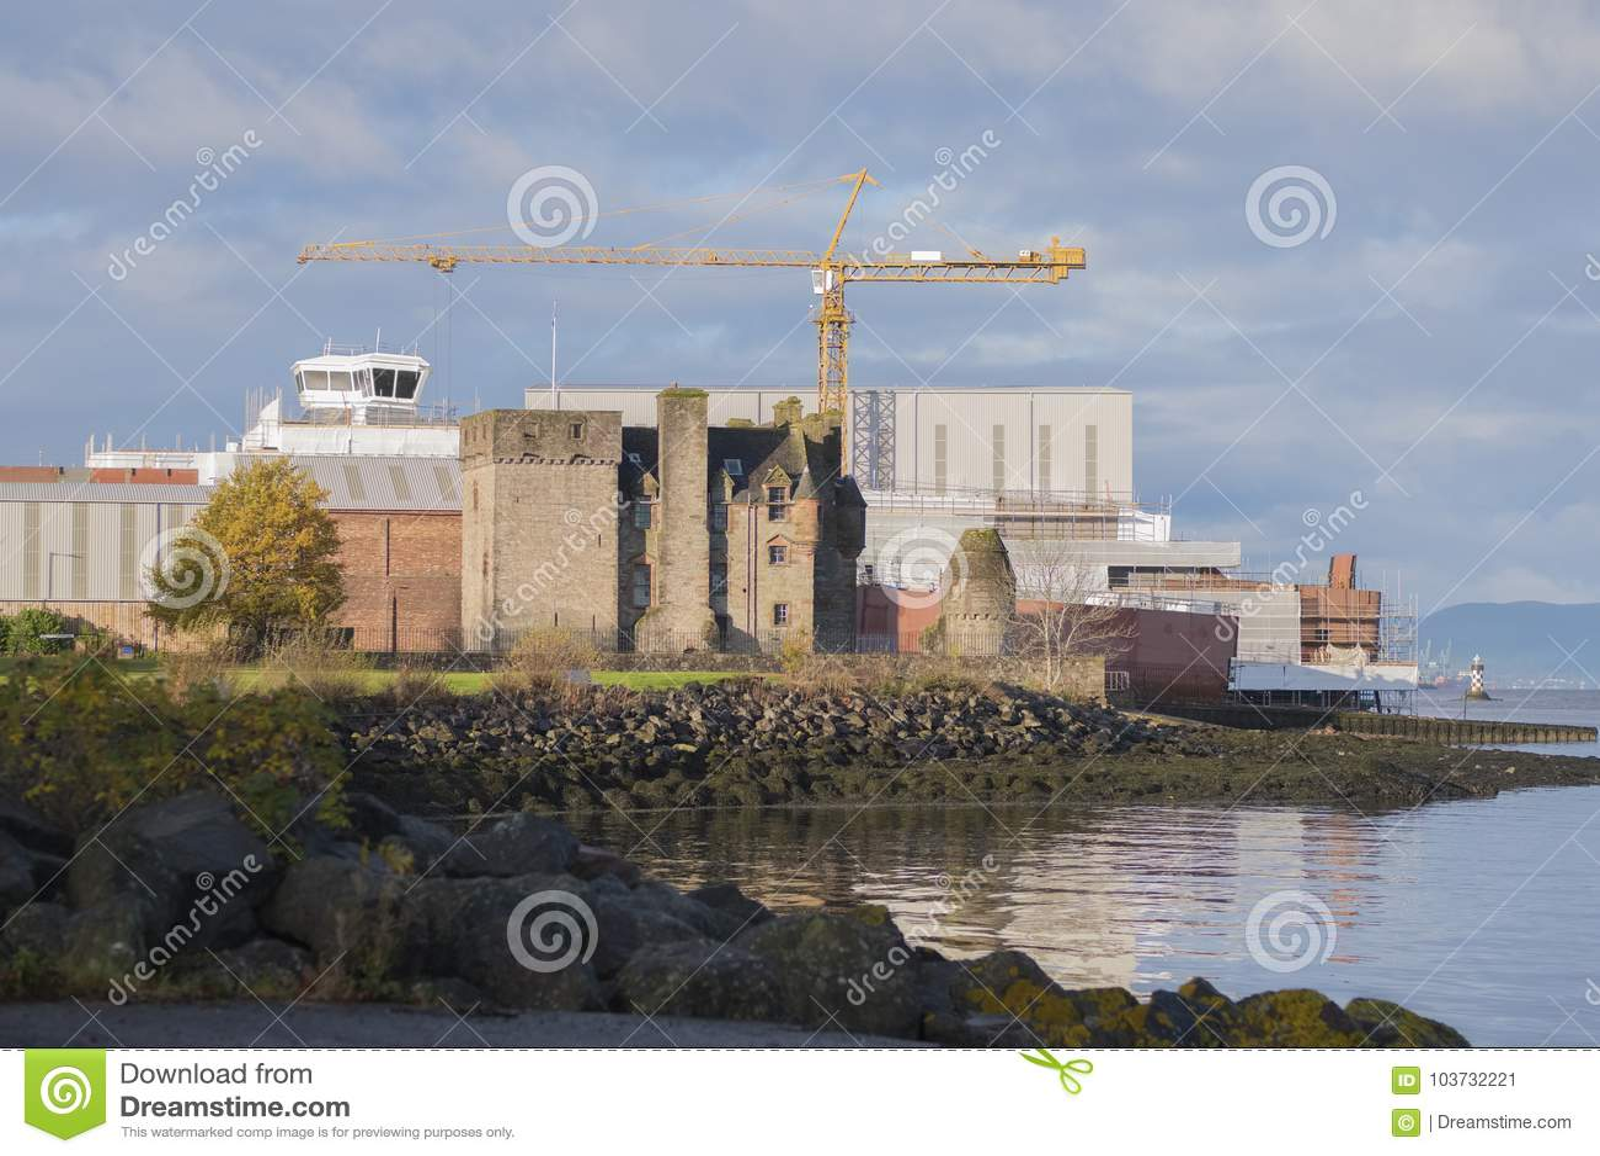 Shipbuilding With Crane and Newark Castle In Port Glasgow Scotland Coast sea Beach Traditional Industry